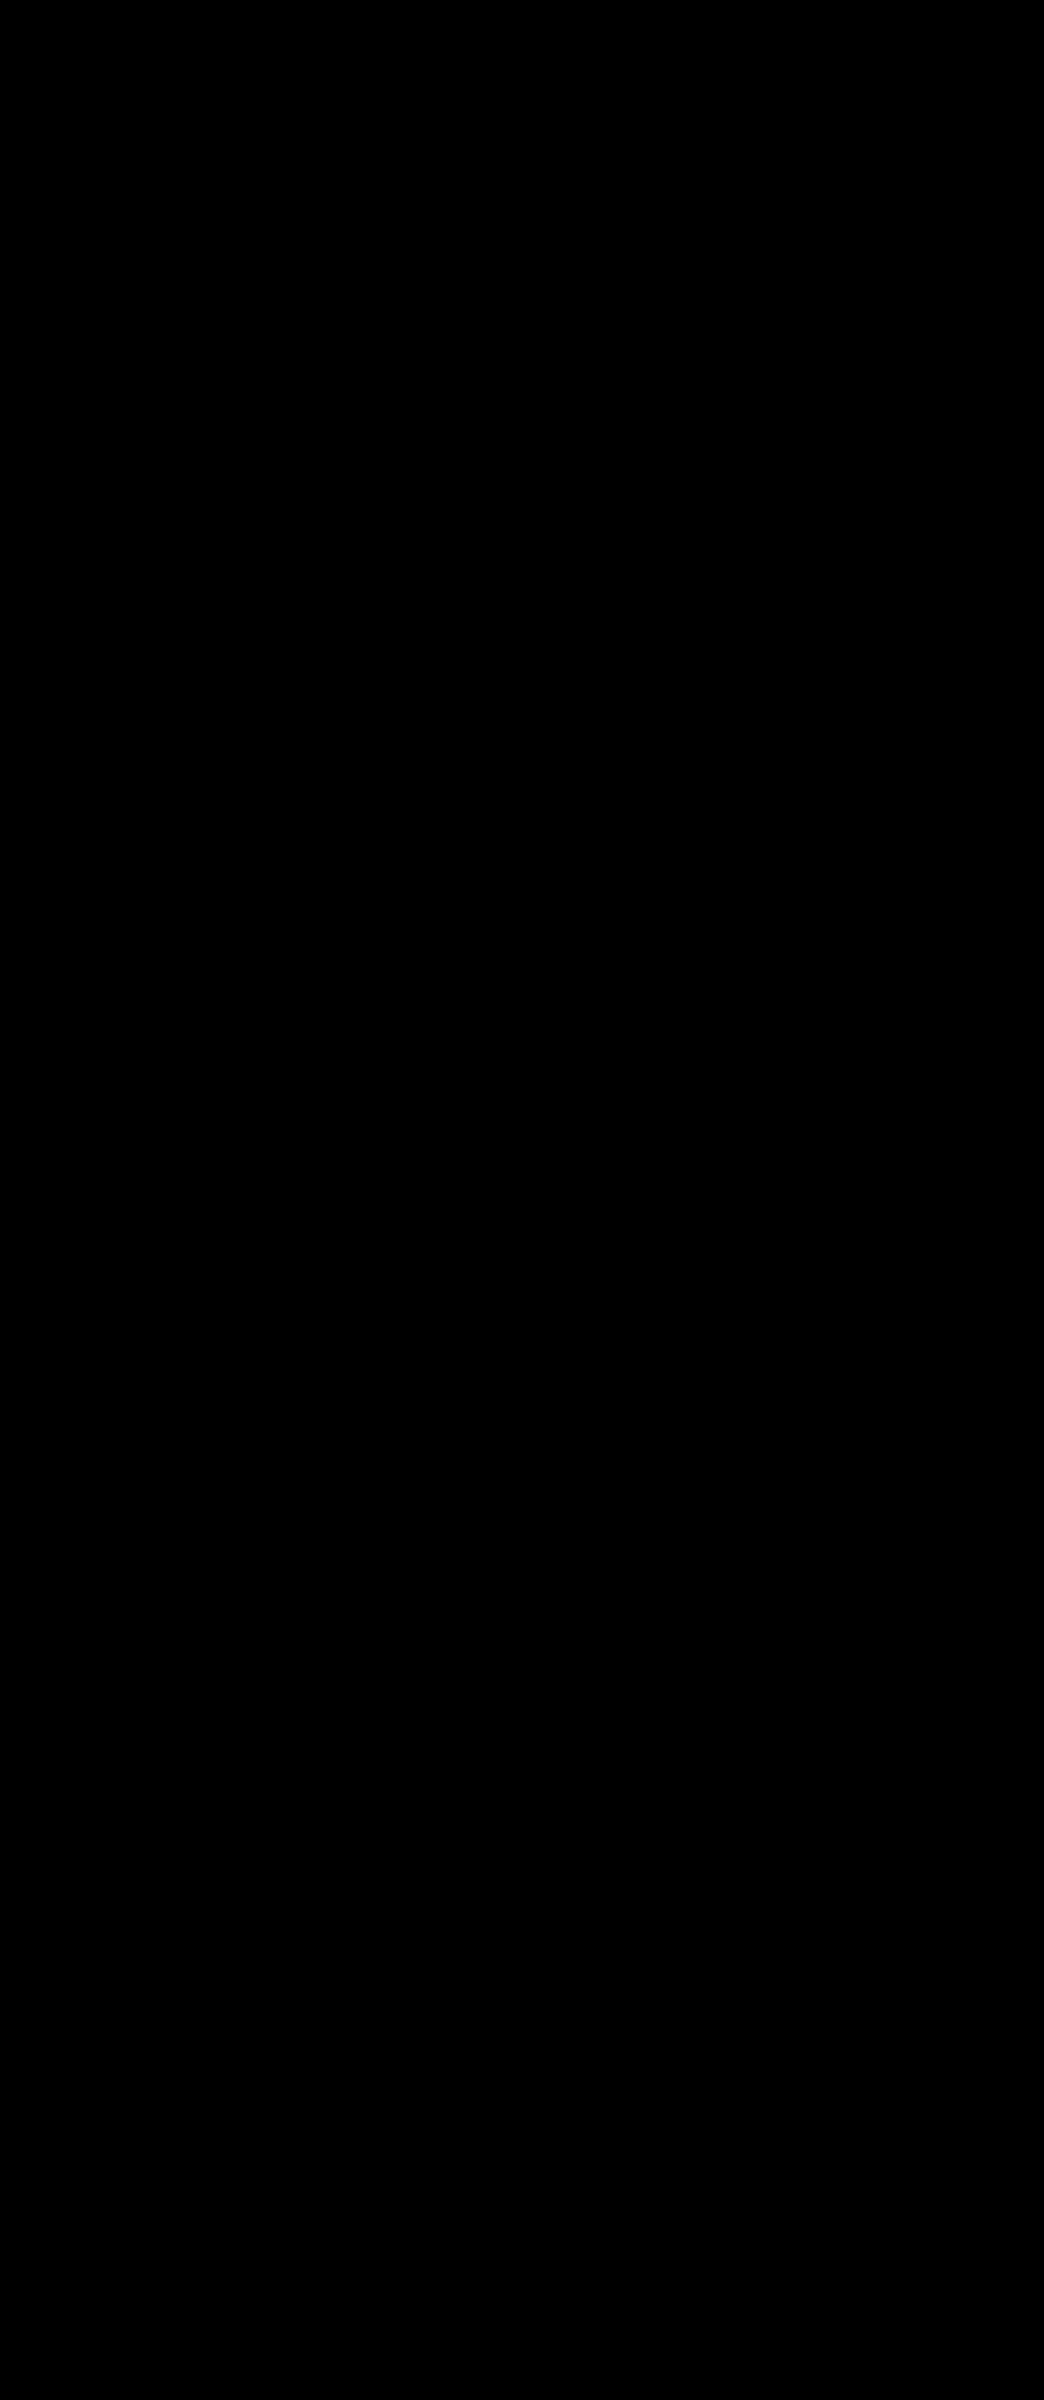 Fancy flower clipart black and white clip art black and white Clipart - Heartsease (silhouette) clip art black and white